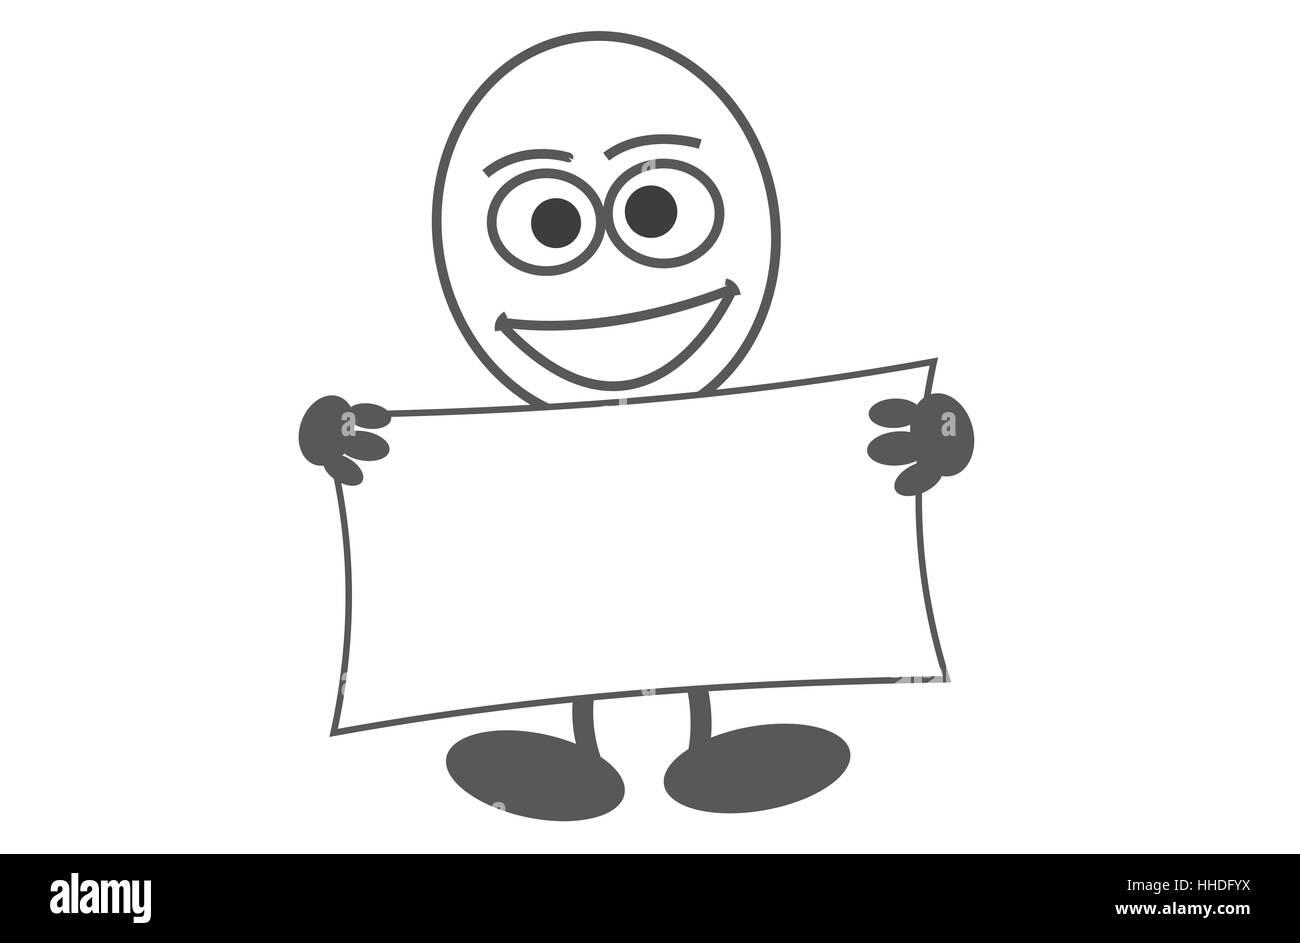 comic, comic, male, masculine, poster, lettering, banner, funny, panel, design, Stock Photo